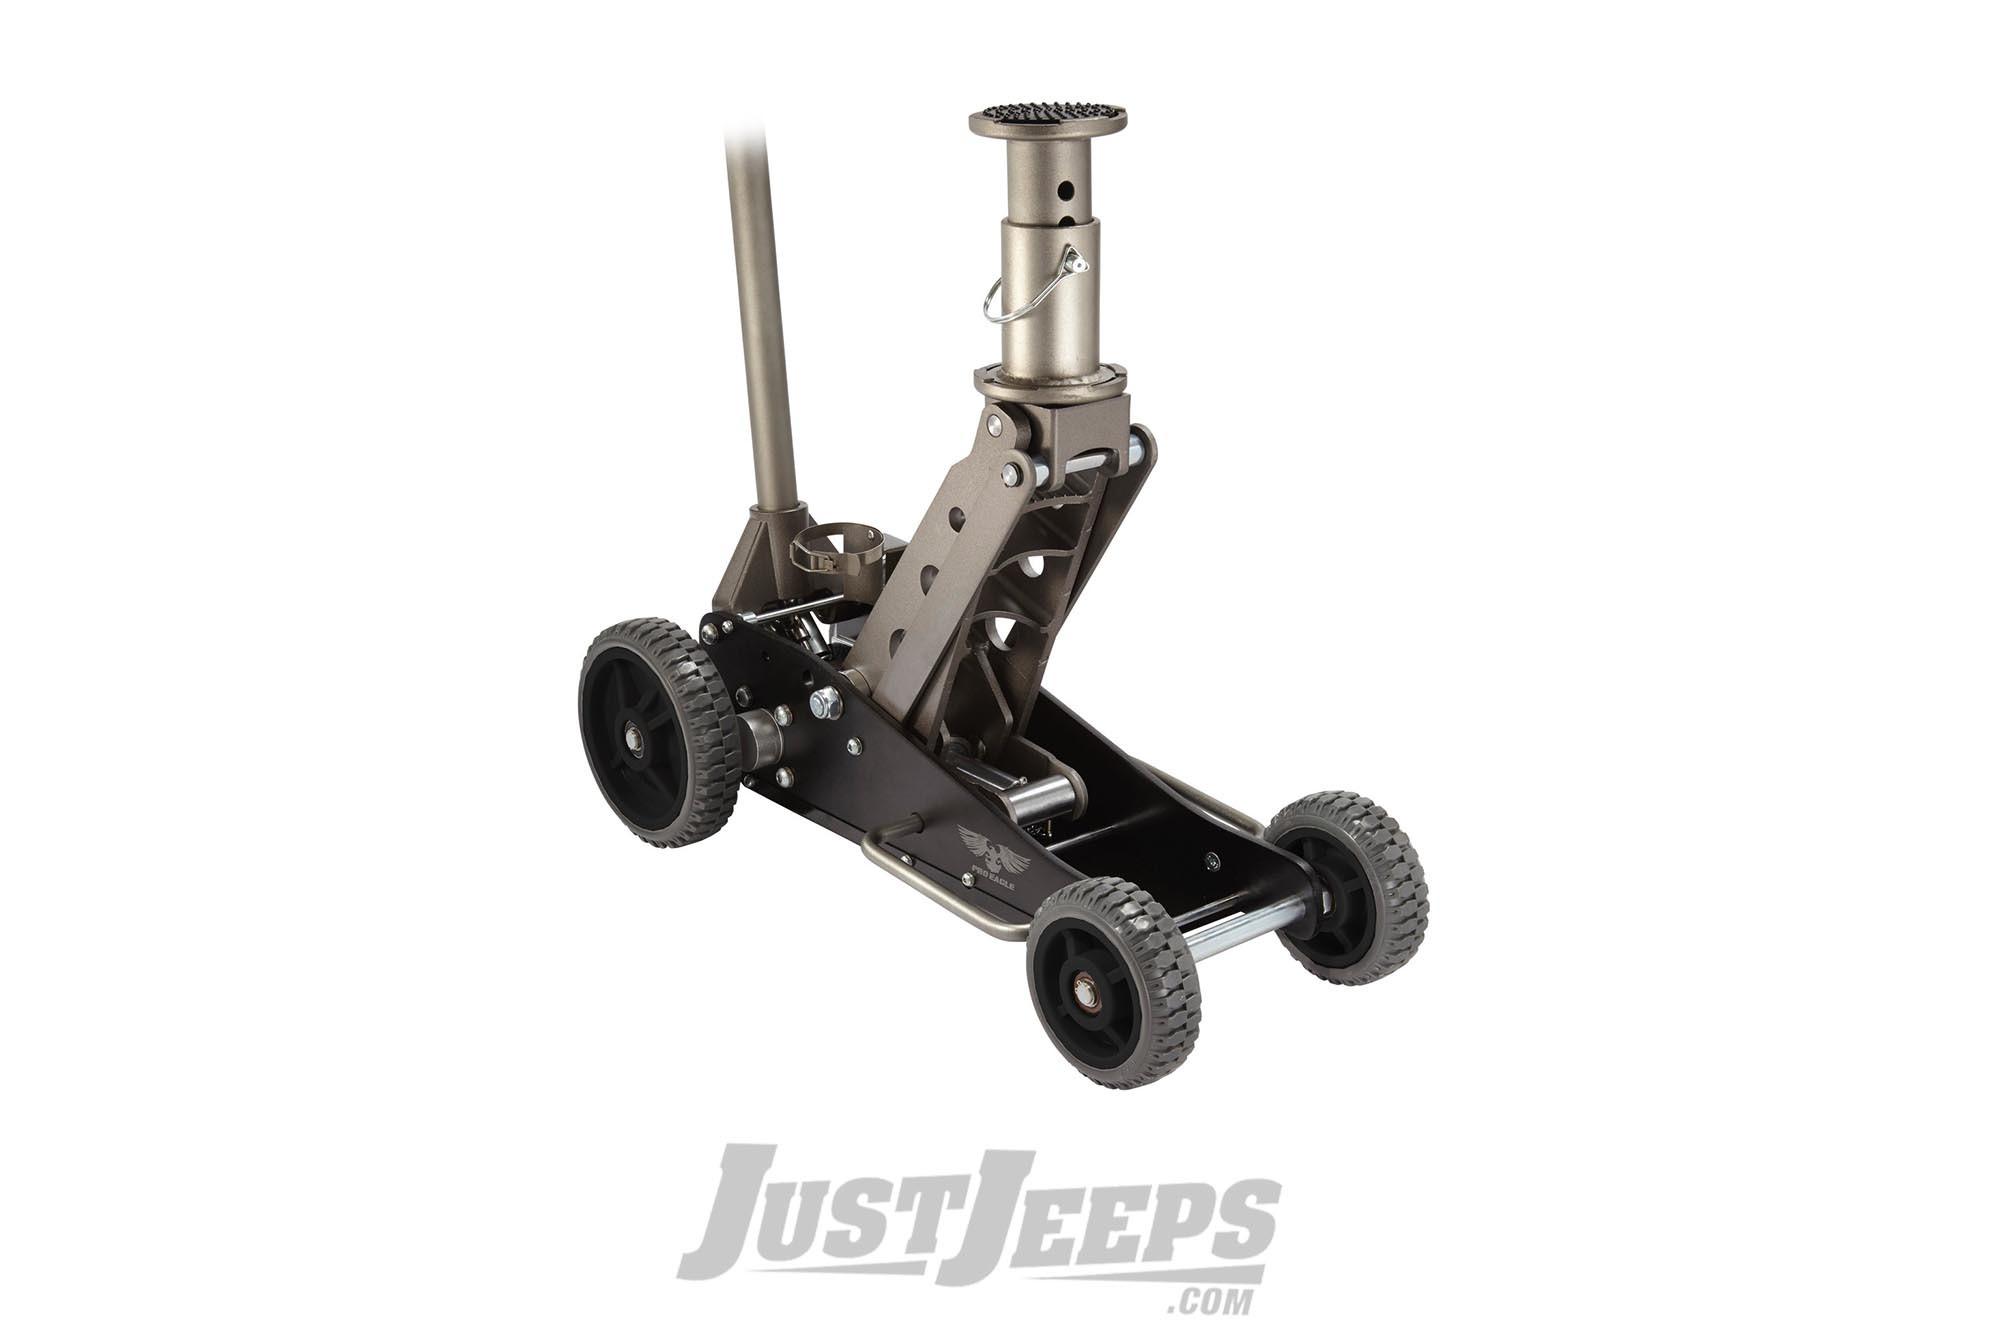 Just Jeeps Pro Eagle 2 Ton Big Wheel Off Road Jack The